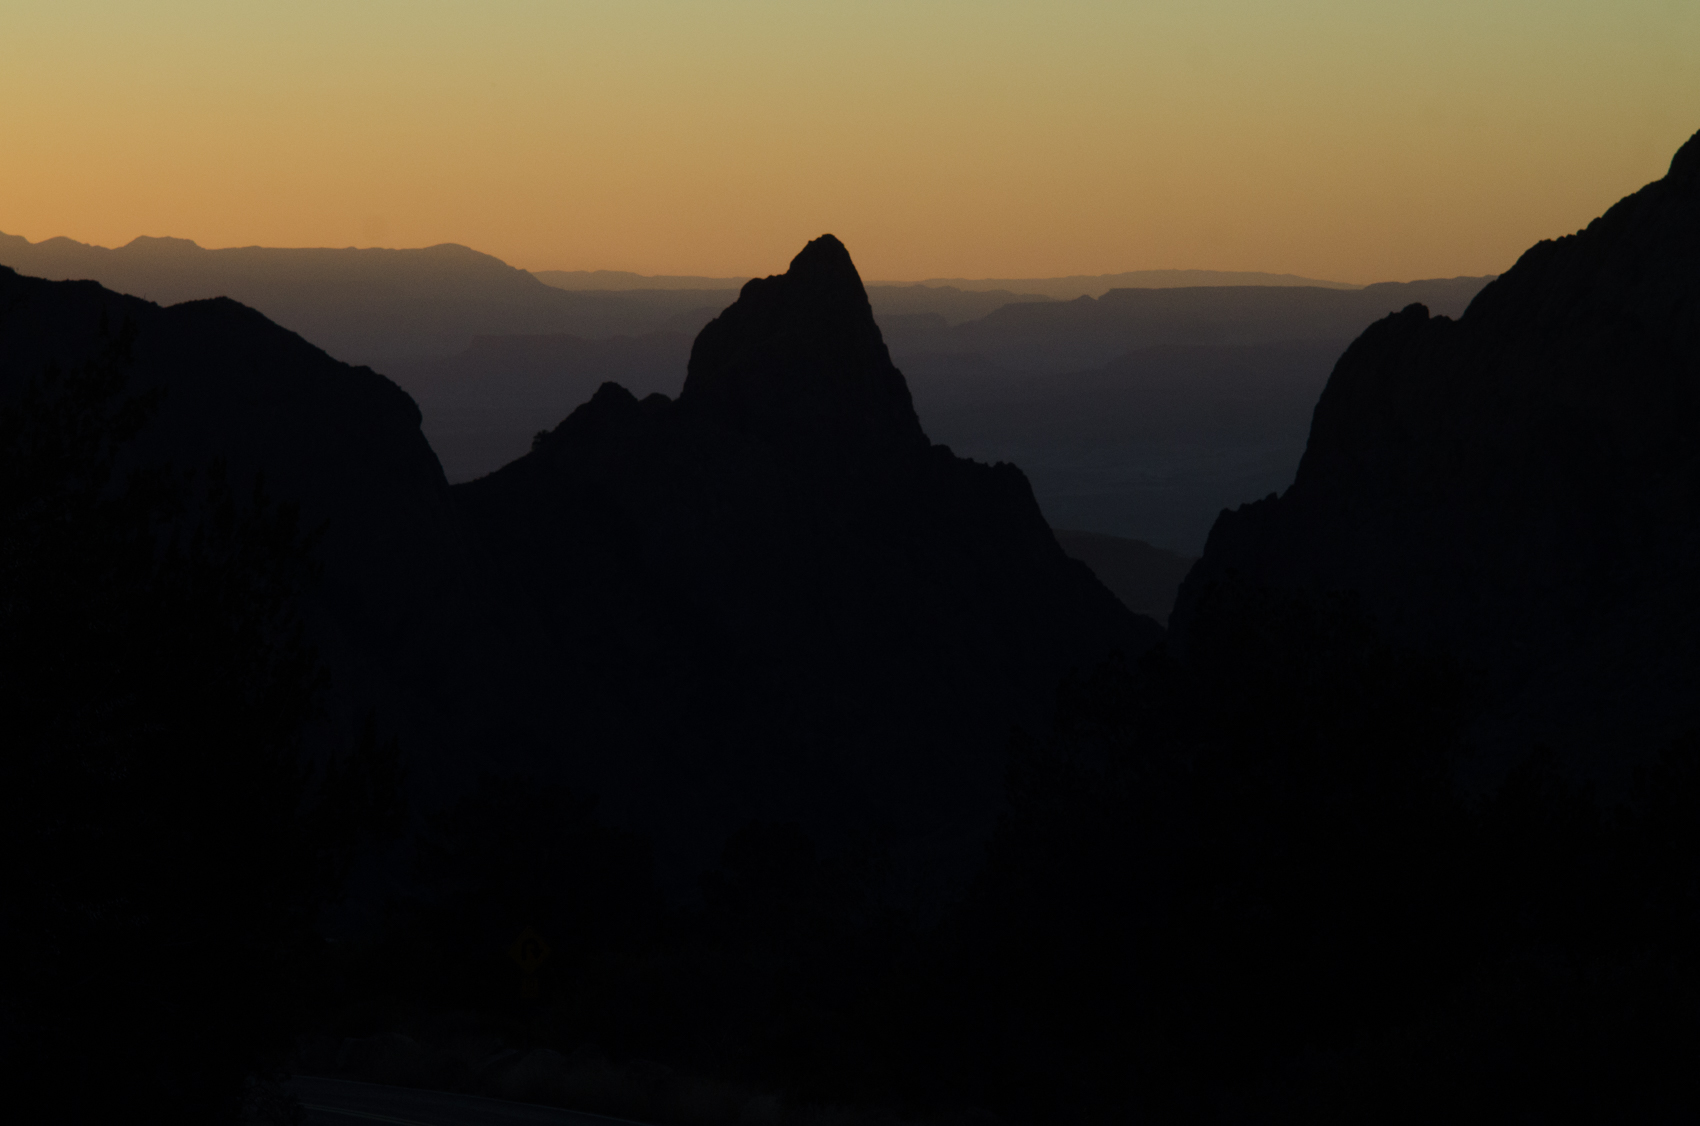 Mountain biking in big bend national park-leh cycling goods-6.jpg